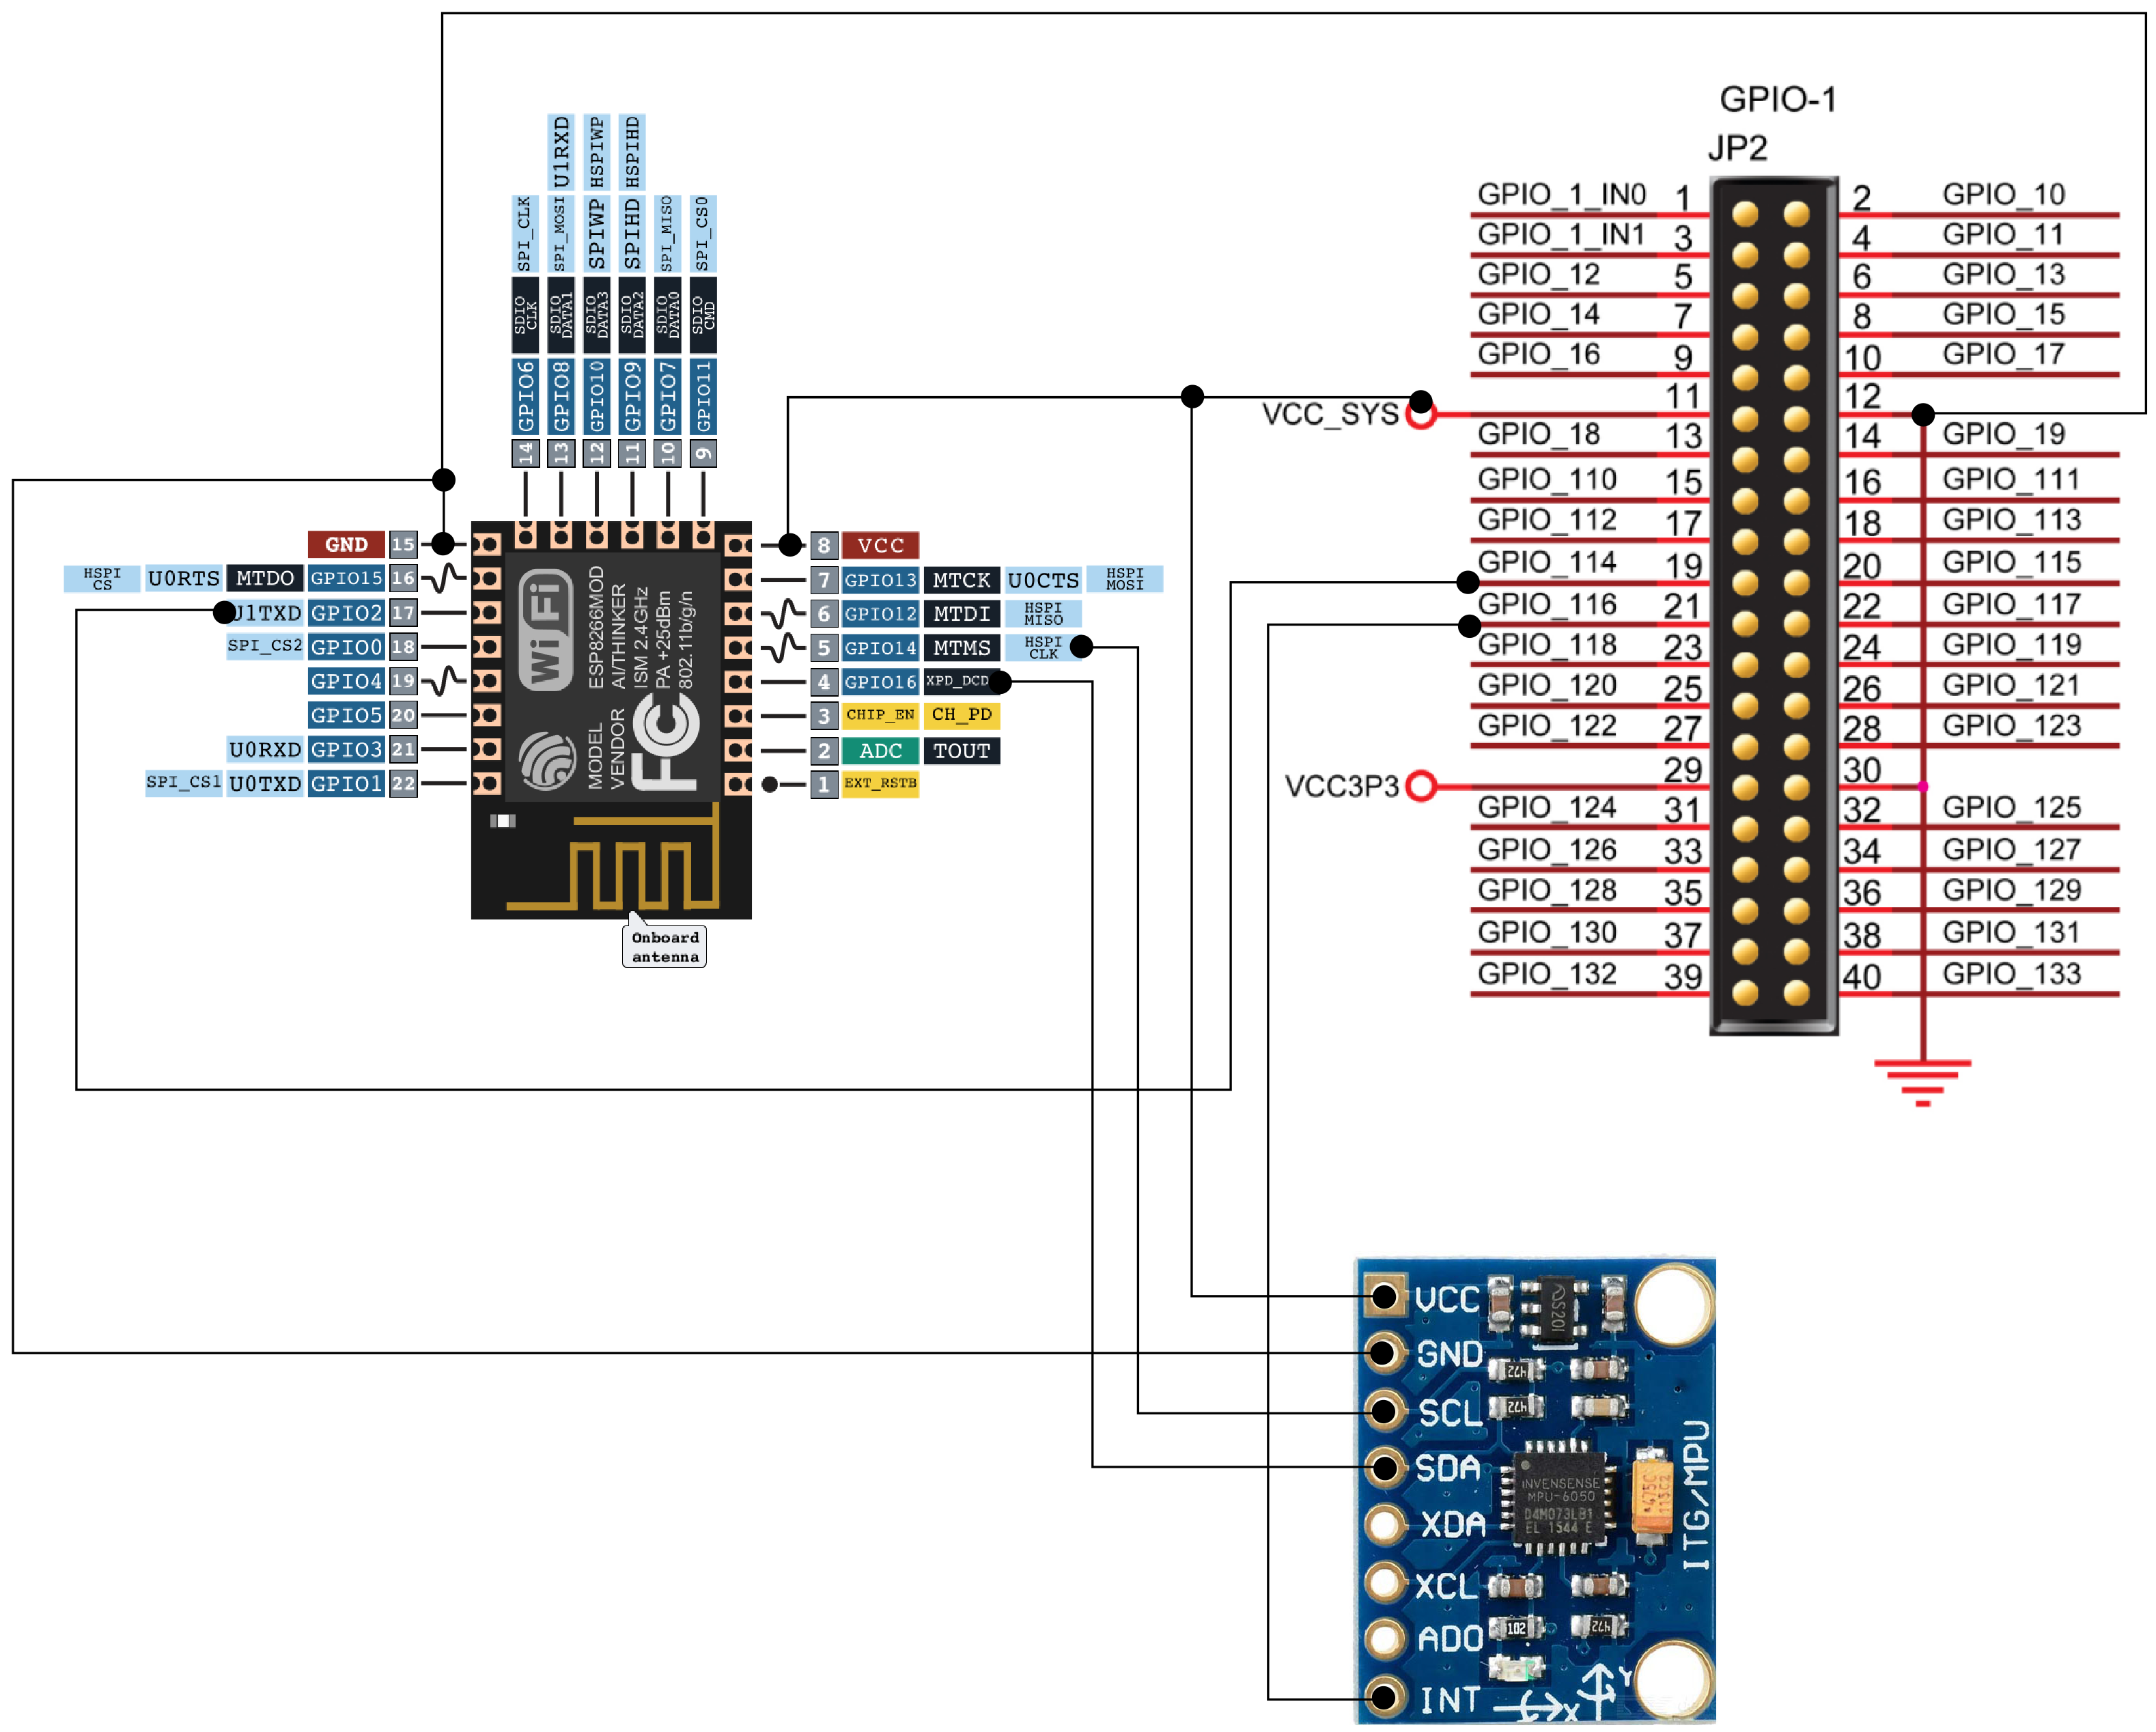 Tremendous Mpu6050 Wiring Diagram Basic Electronics Wiring Diagram Wiring 101 Photwellnesstrialsorg